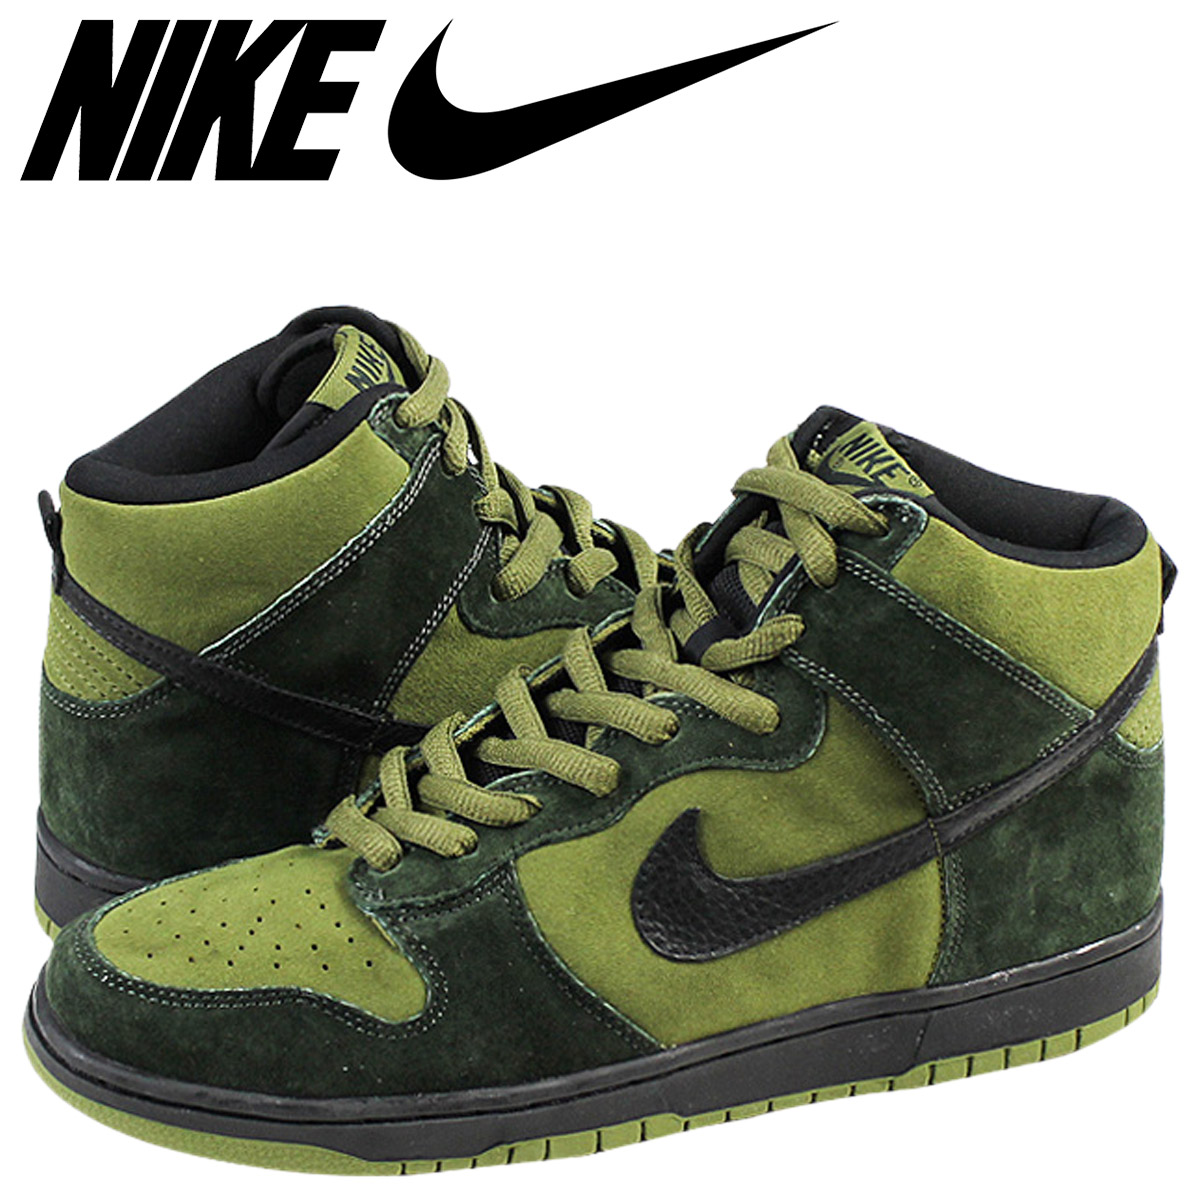 c9538f5aa8ed Sugar Online Shop  Nike NIKE dunk sneakers DUNK HI PRO SB Dunk high ...